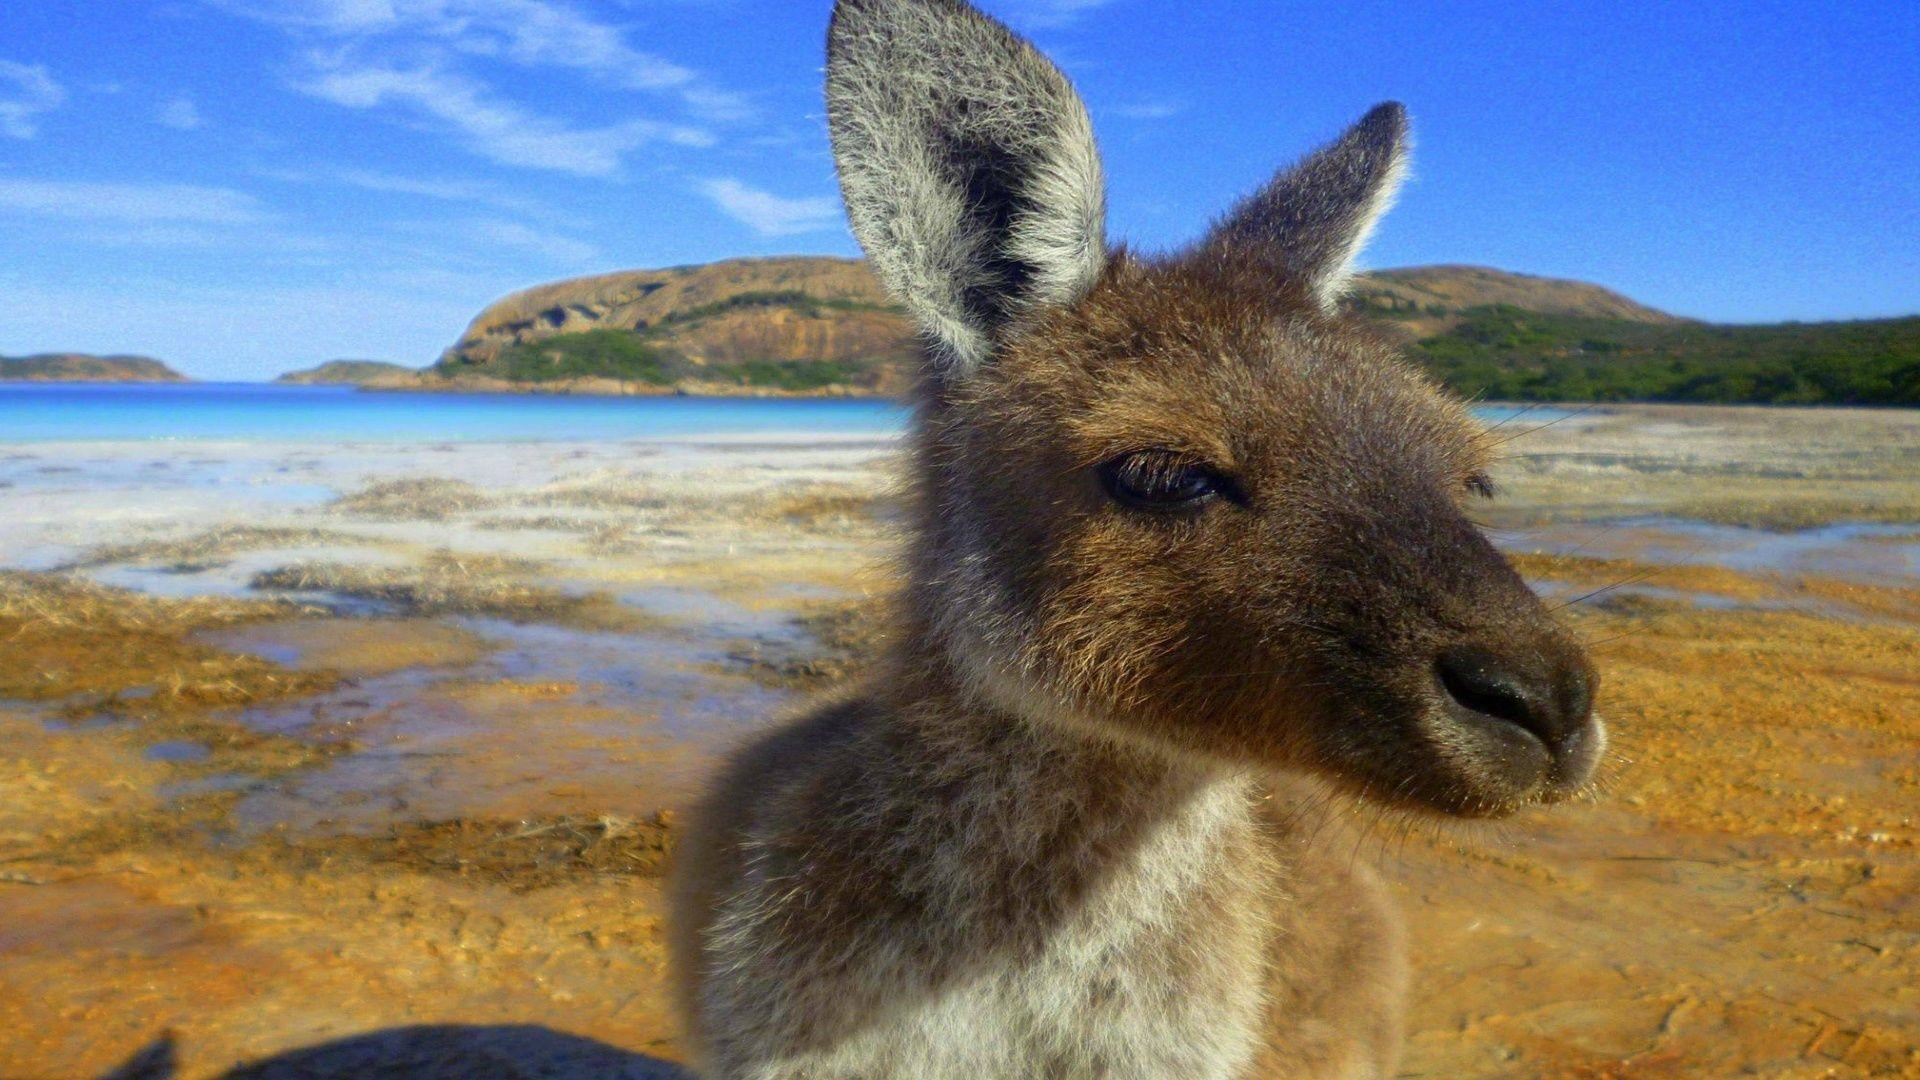 Australian Kangaroo Wallpapers